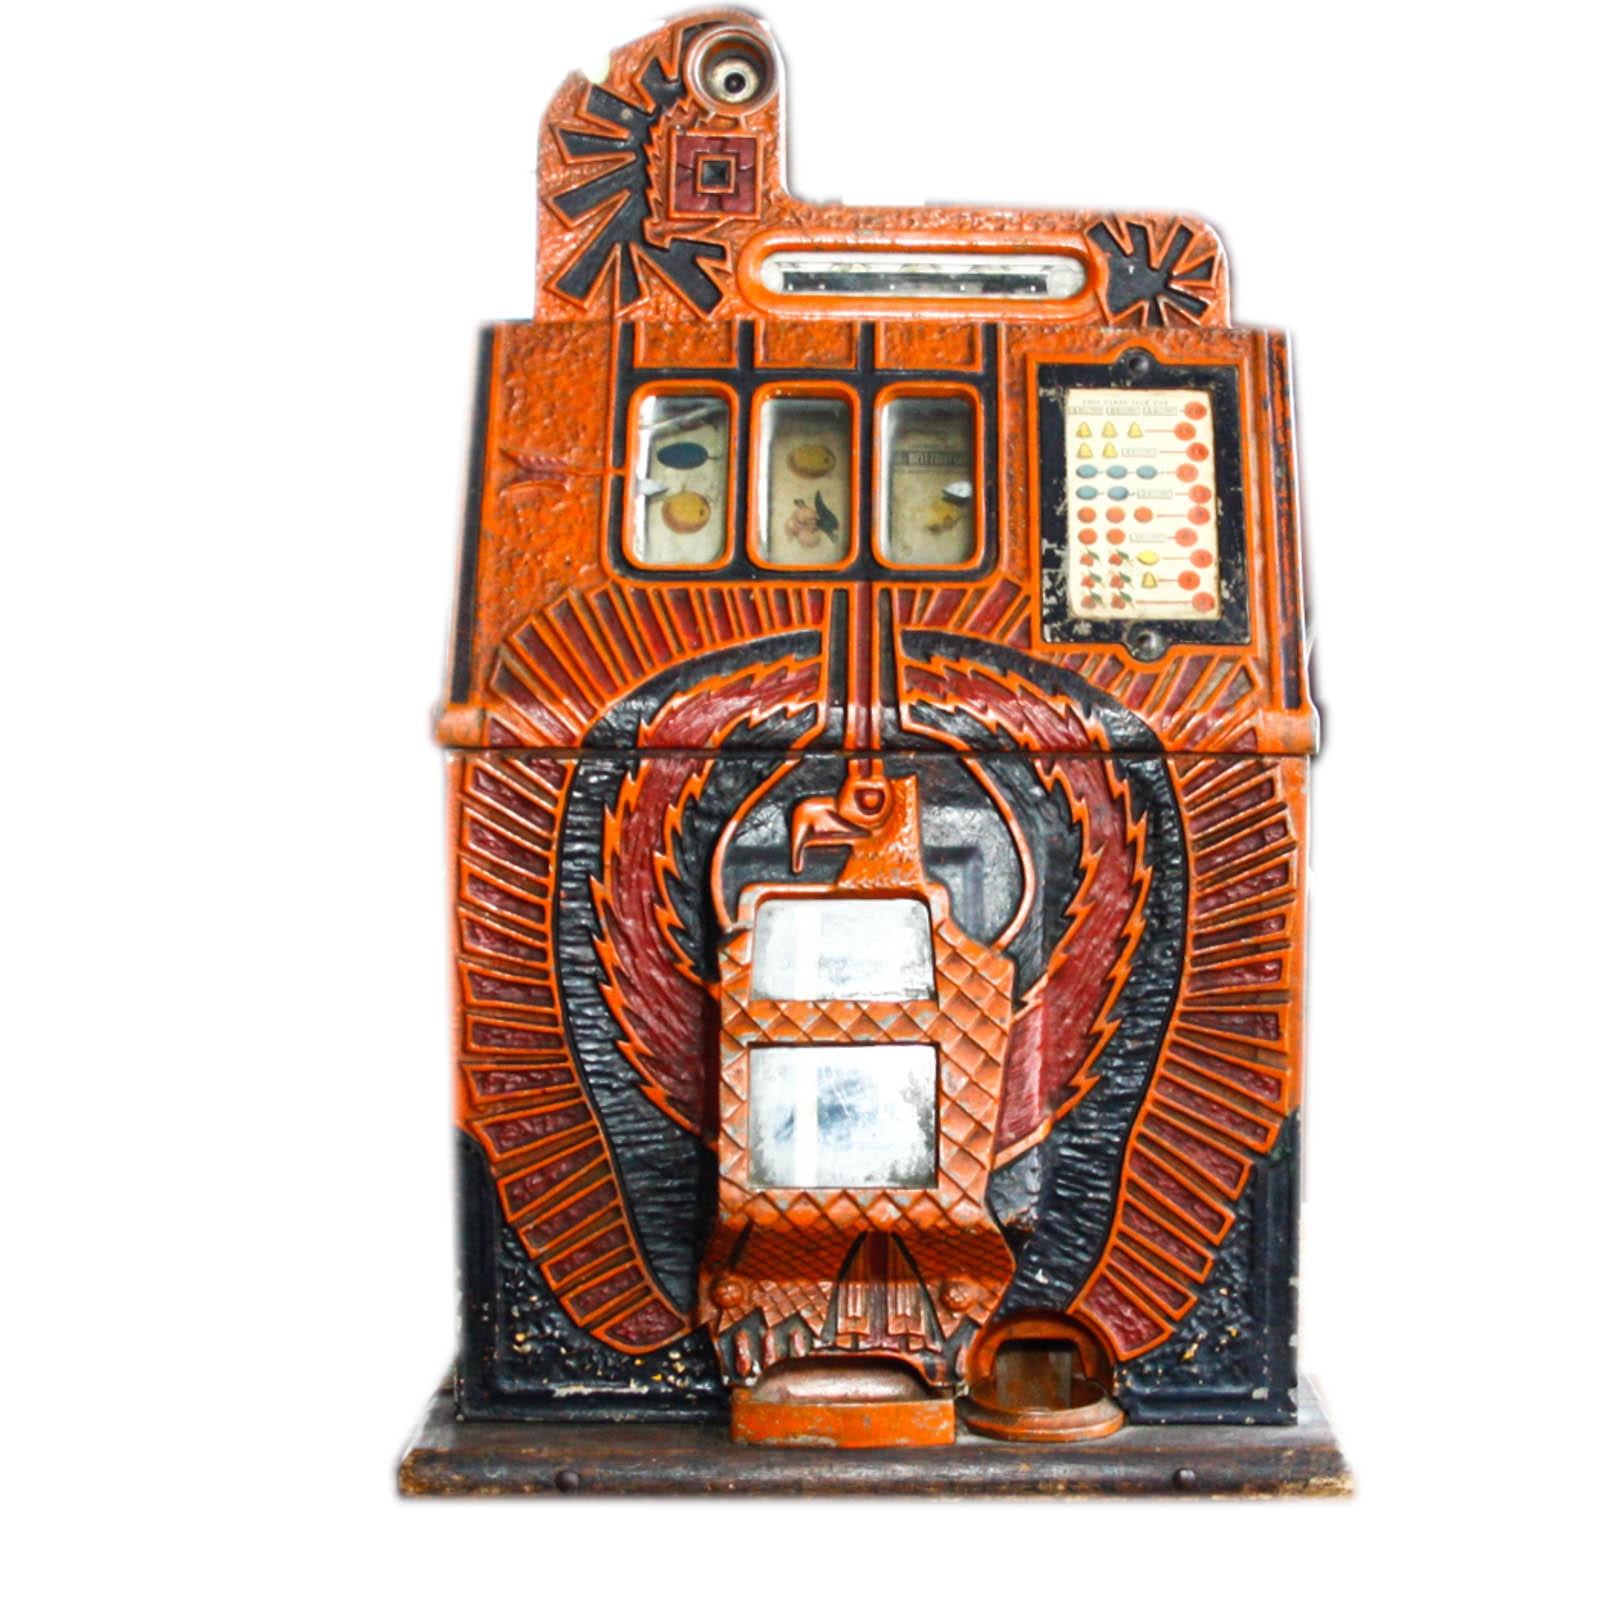 1940s Mills War Eagle Slot Machine